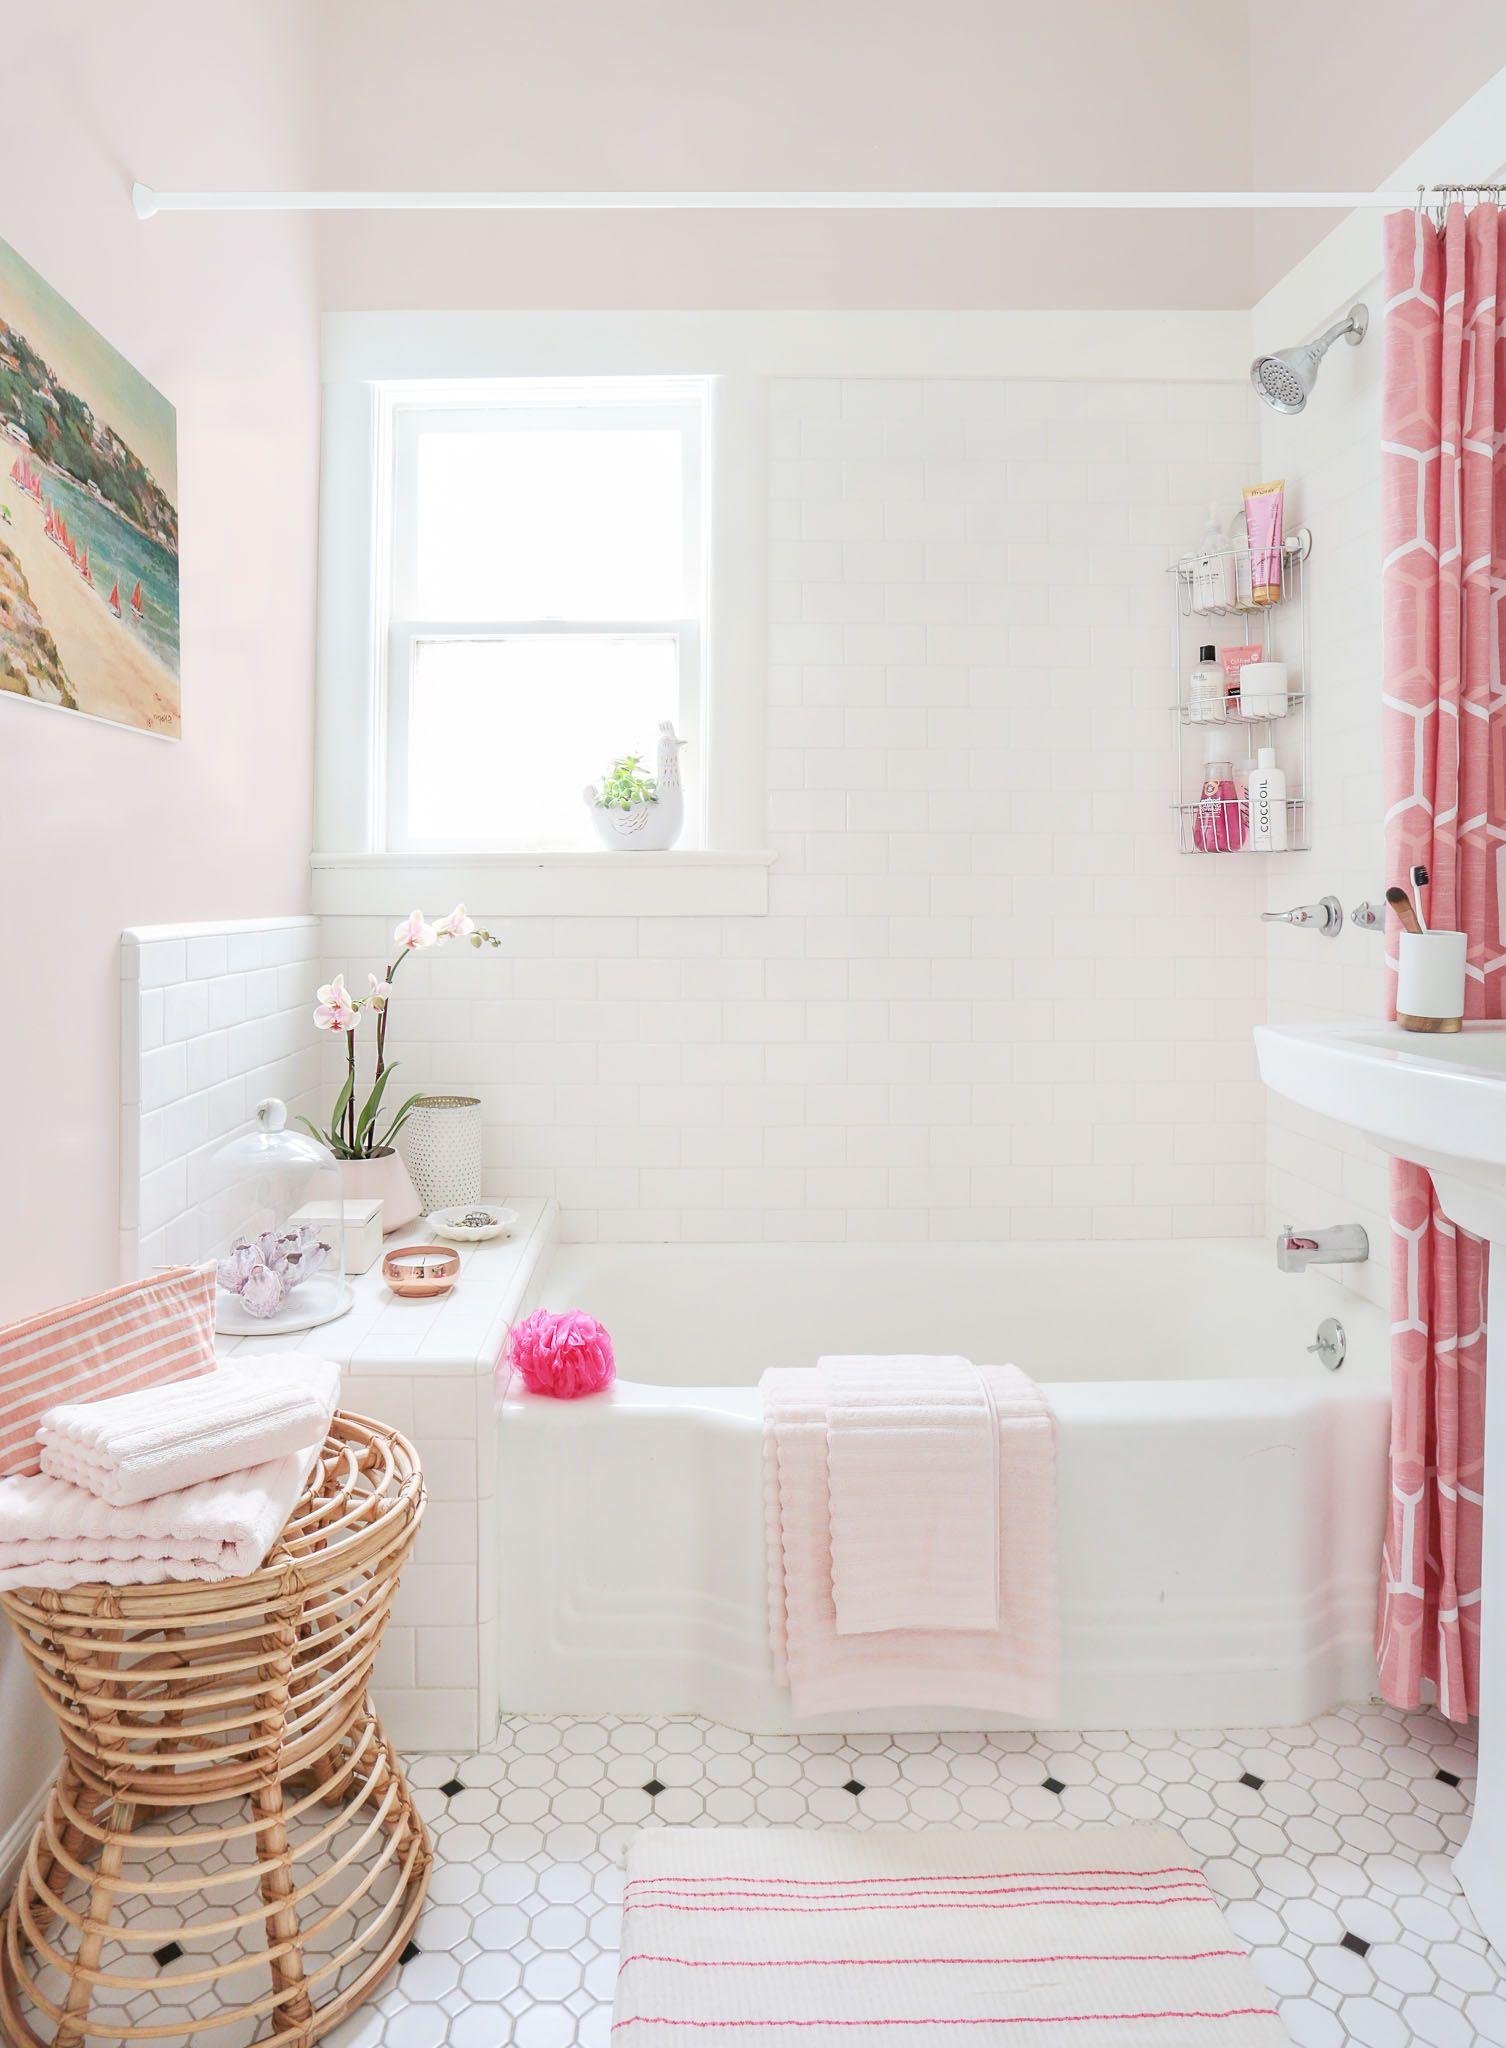 mini bathroom top a uk decor small make design ensuite bathtubs ideas splash freestanding pink designs